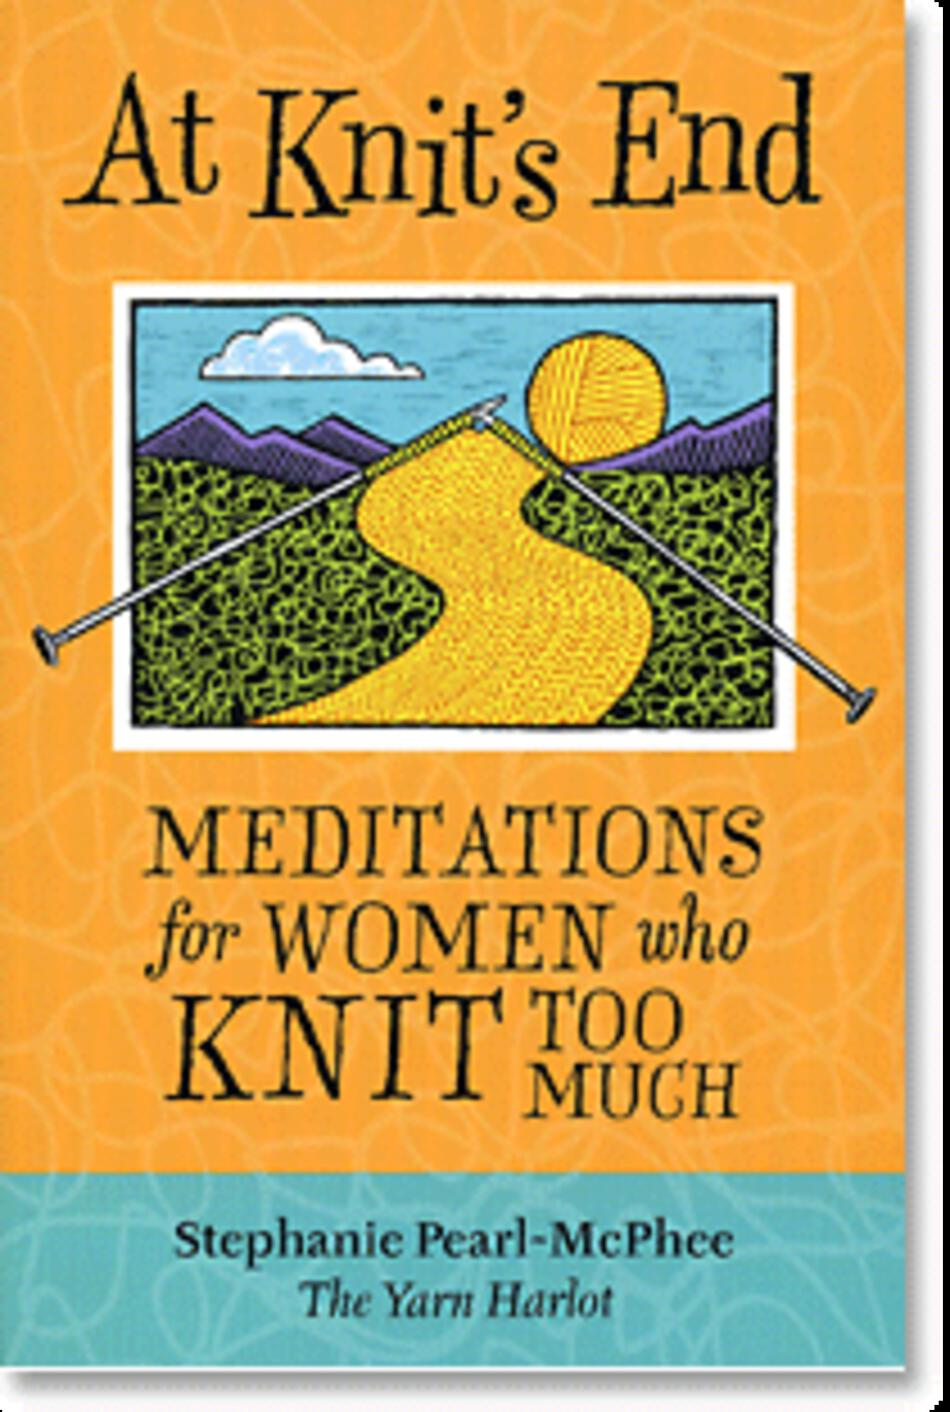 Knitting Warehouse Location : At knit s end knitting book halcyon yarn